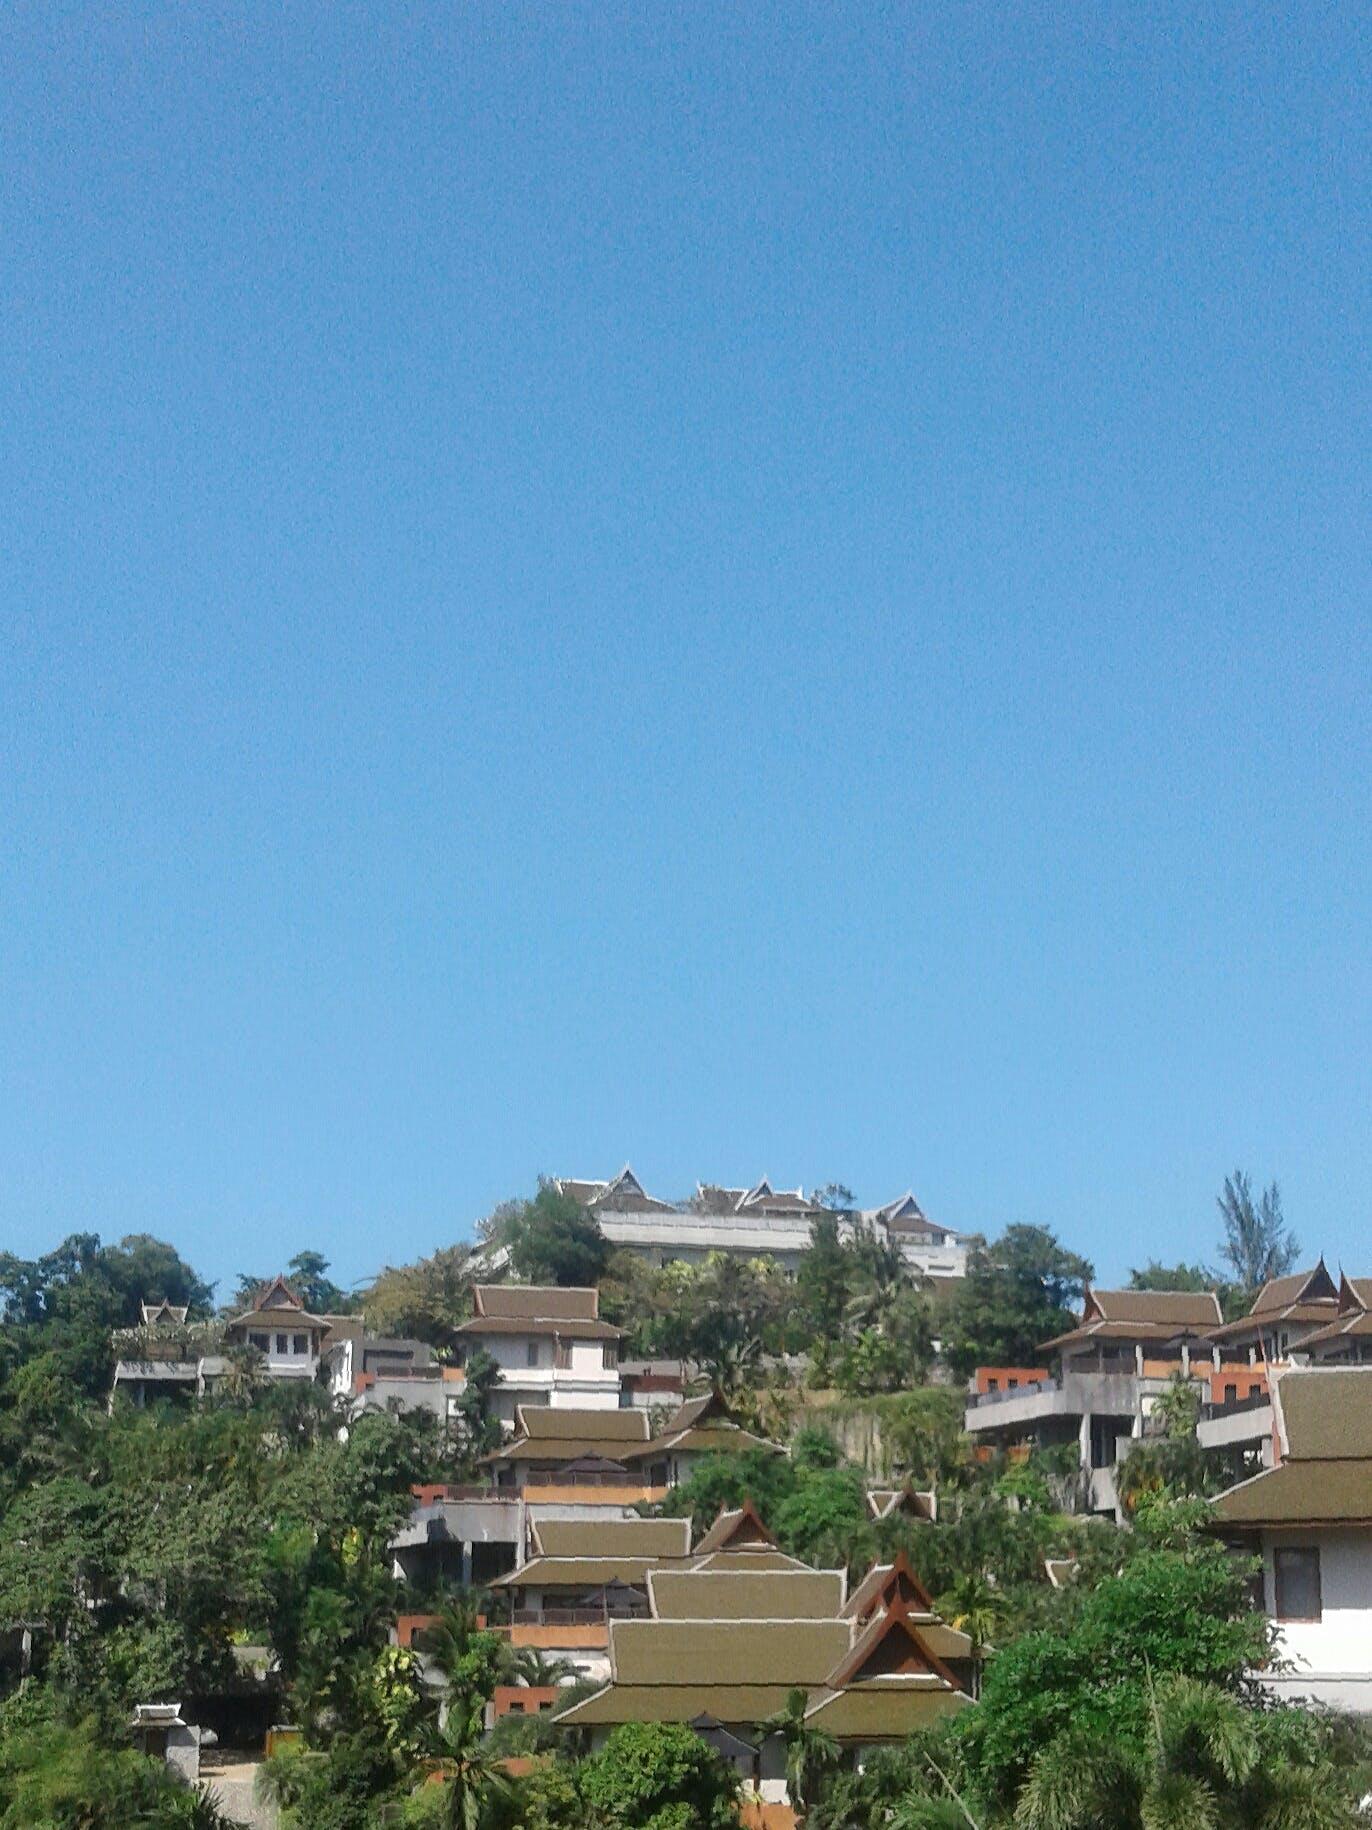 Free stock photo of blue sky, houses, Kamala beach, phuket